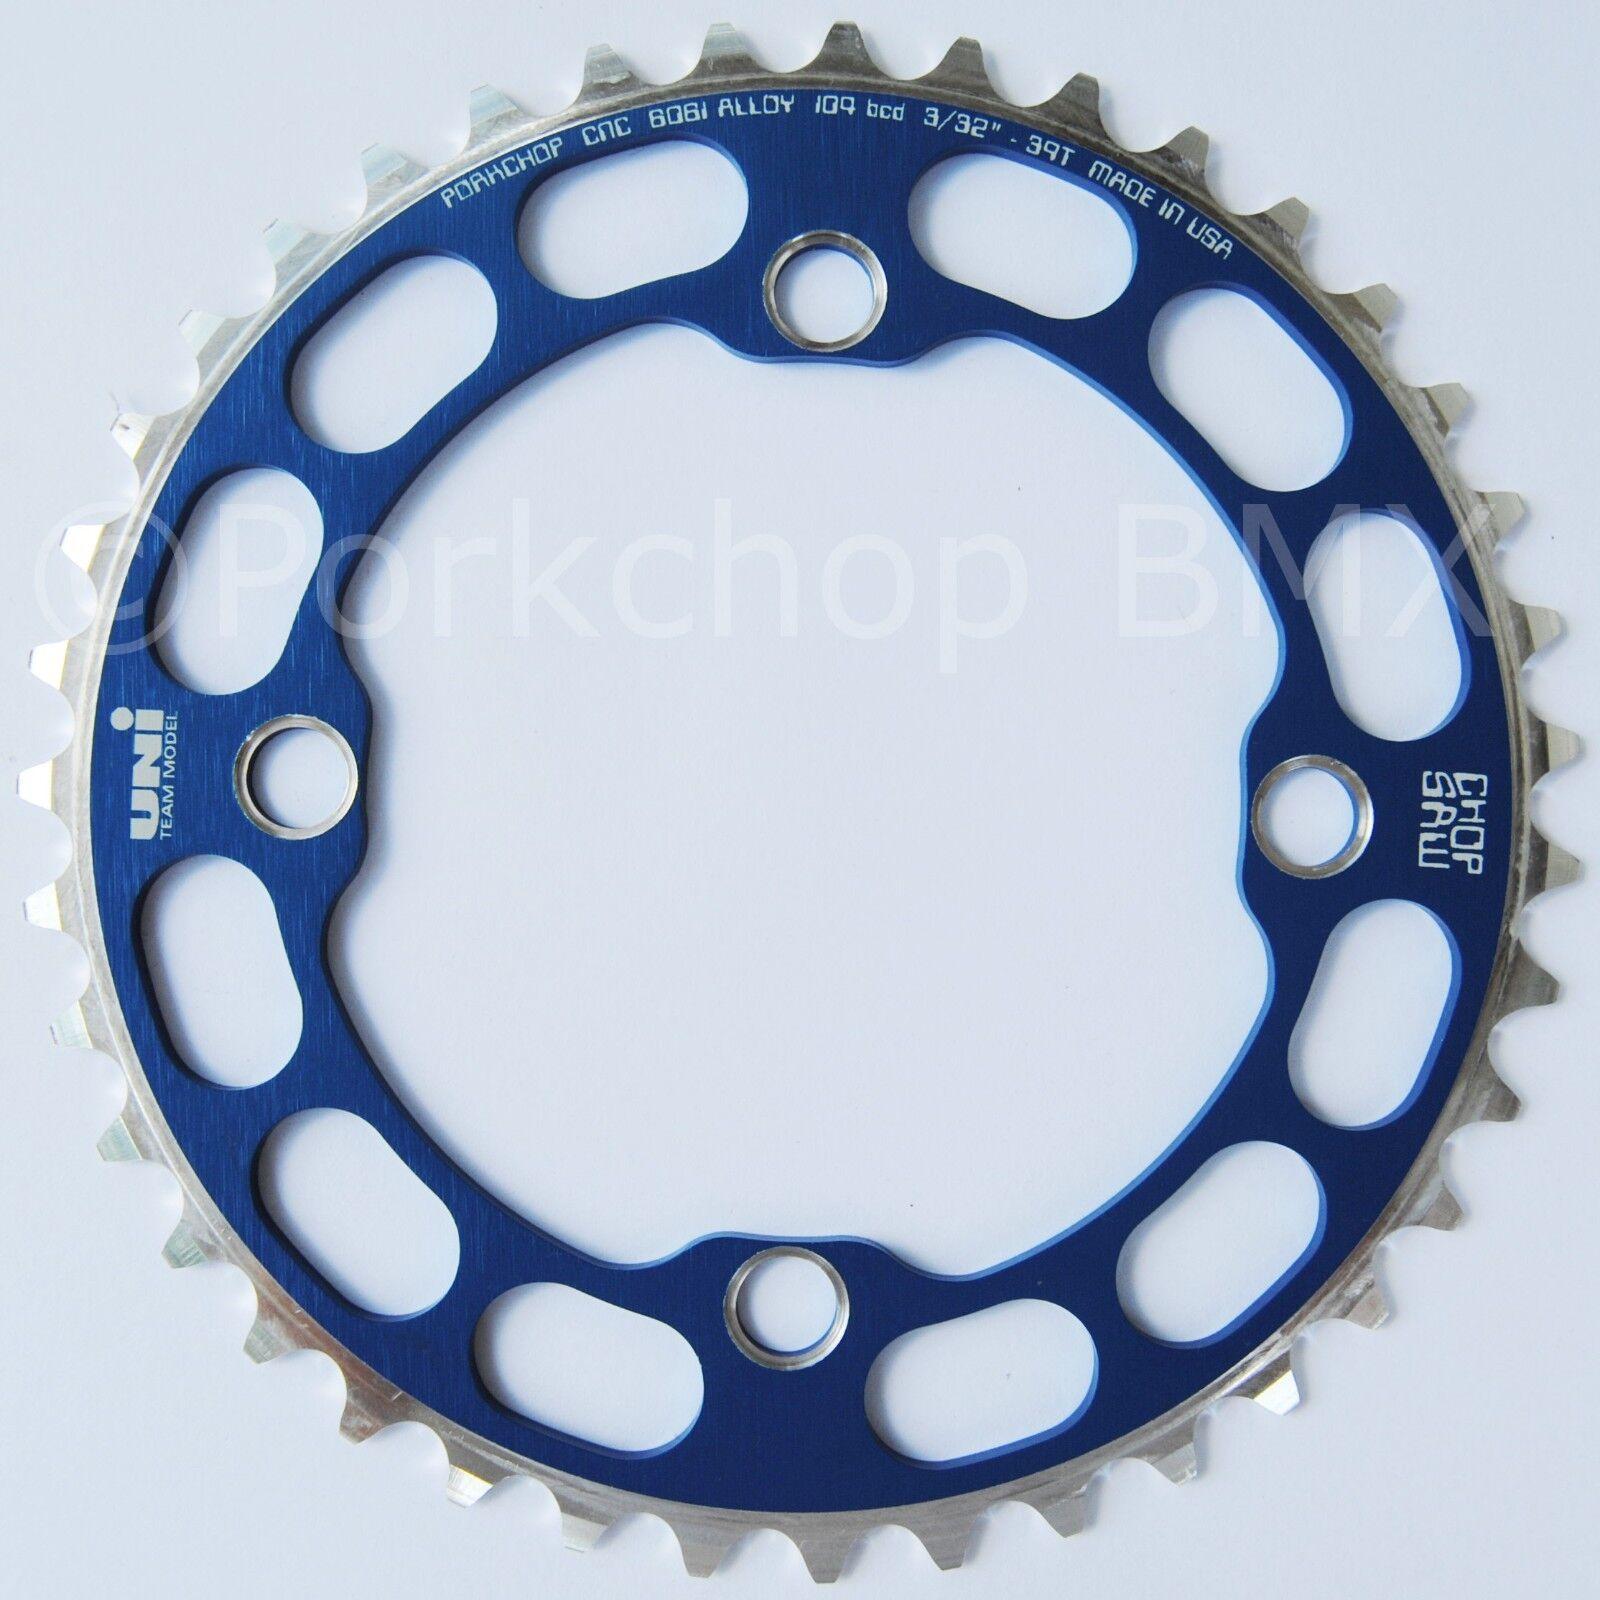 Porkchop BMX single speed bicycle Chop Saw I Chainring 39T 4 bolt 104 bcd blueE